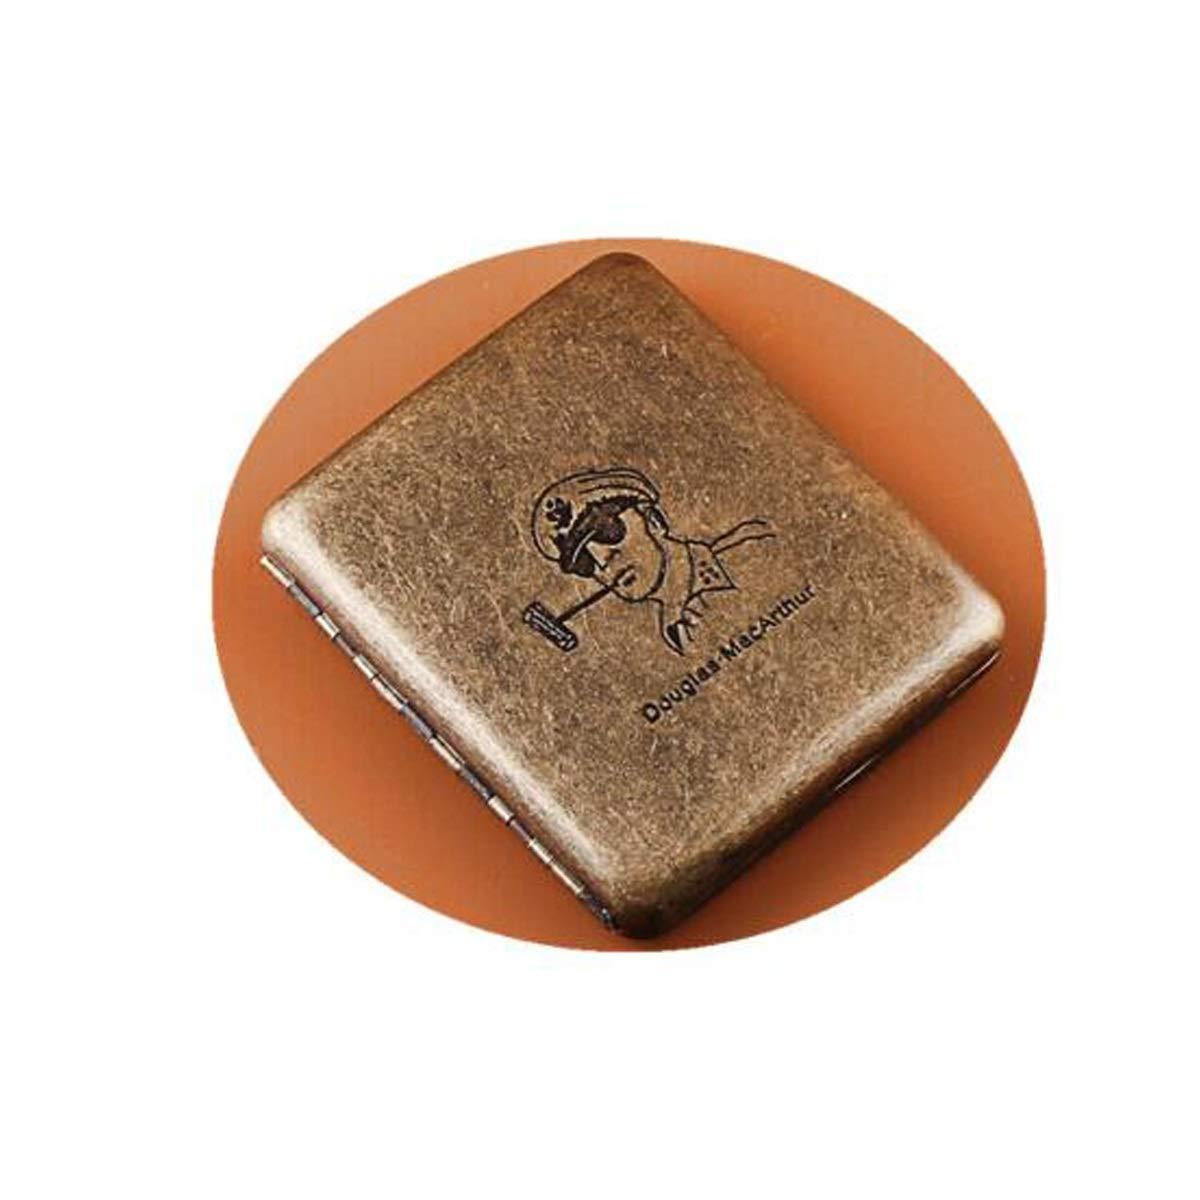 KALMAR Cigarette Holder, 20 Packs of Portable Men's Stainless Steel Cigarette Holders, Cigarette Packs Cigarette Box Cigar Protective Cover (Color : Bronze)